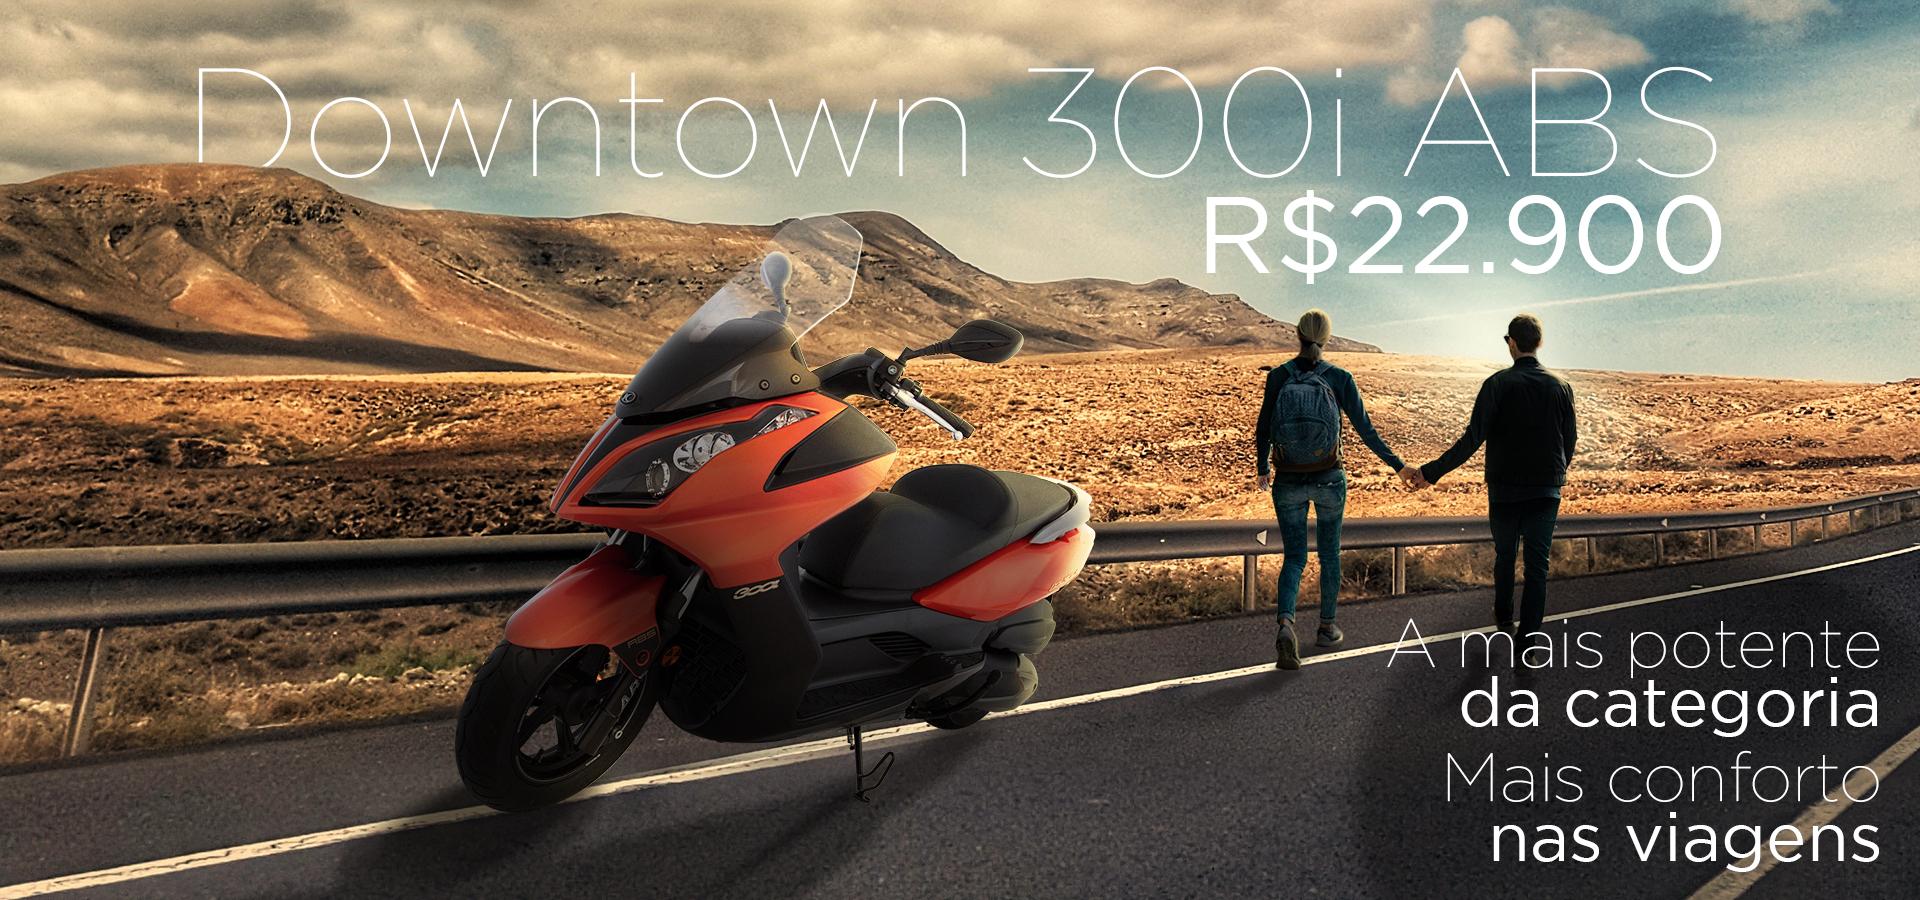 Compre Motocicleta 0km Da Kymco Motos